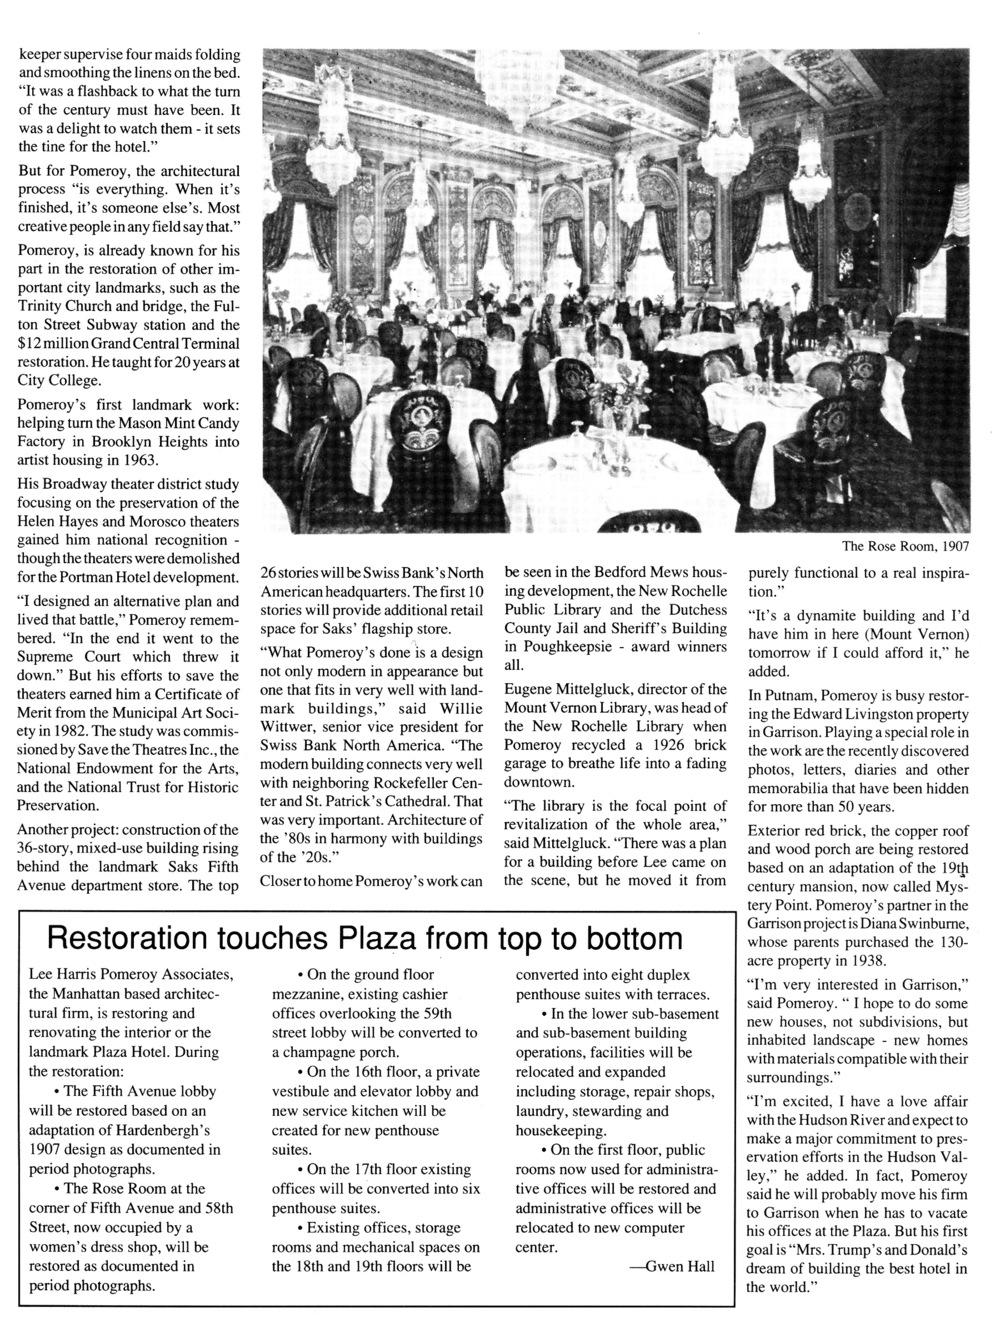 Plaza Hotel Gannett page 2.jpg